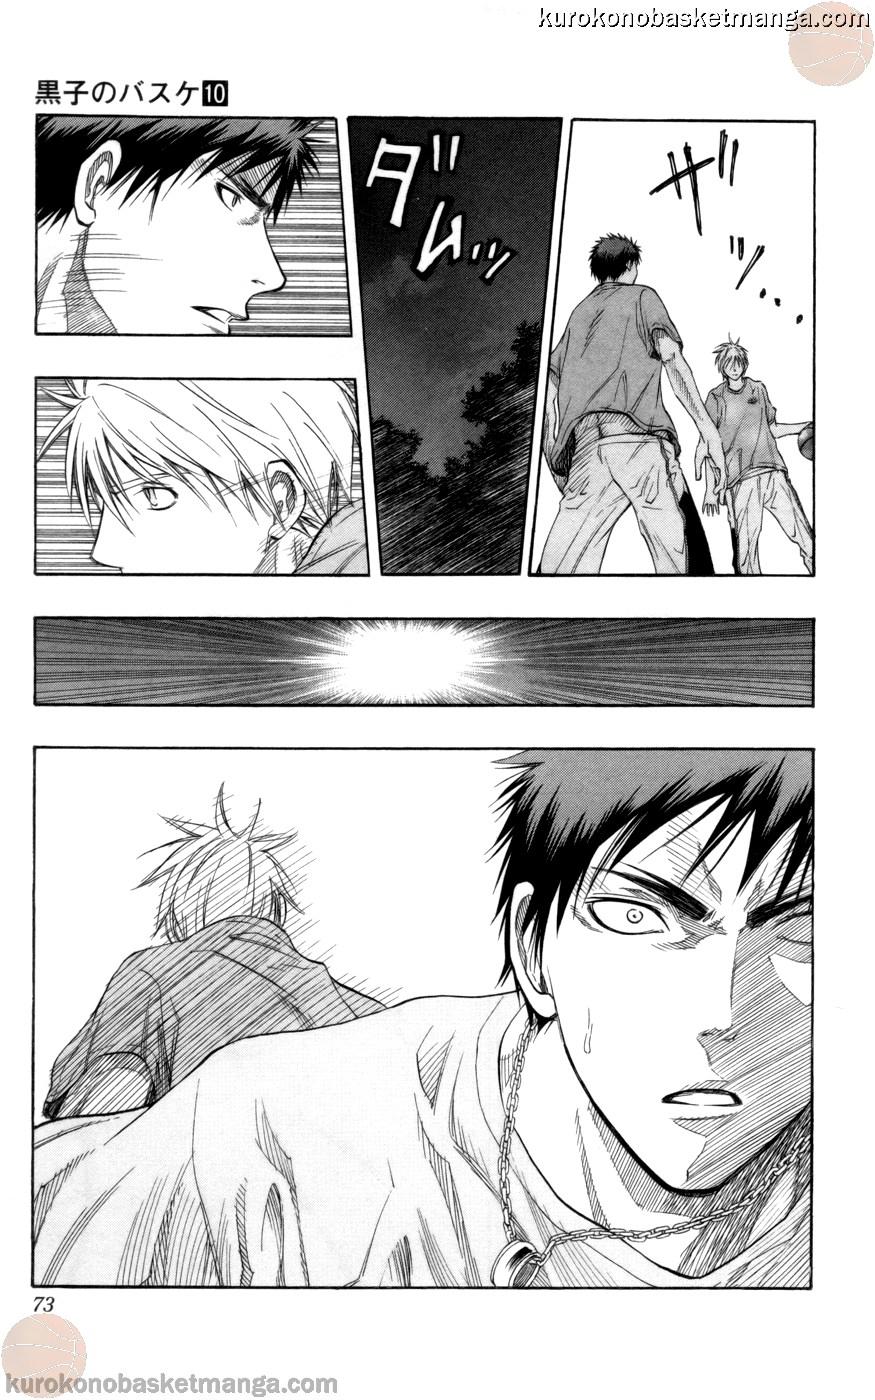 Kuroko no Basket Manga Chapter 84 - Image 07